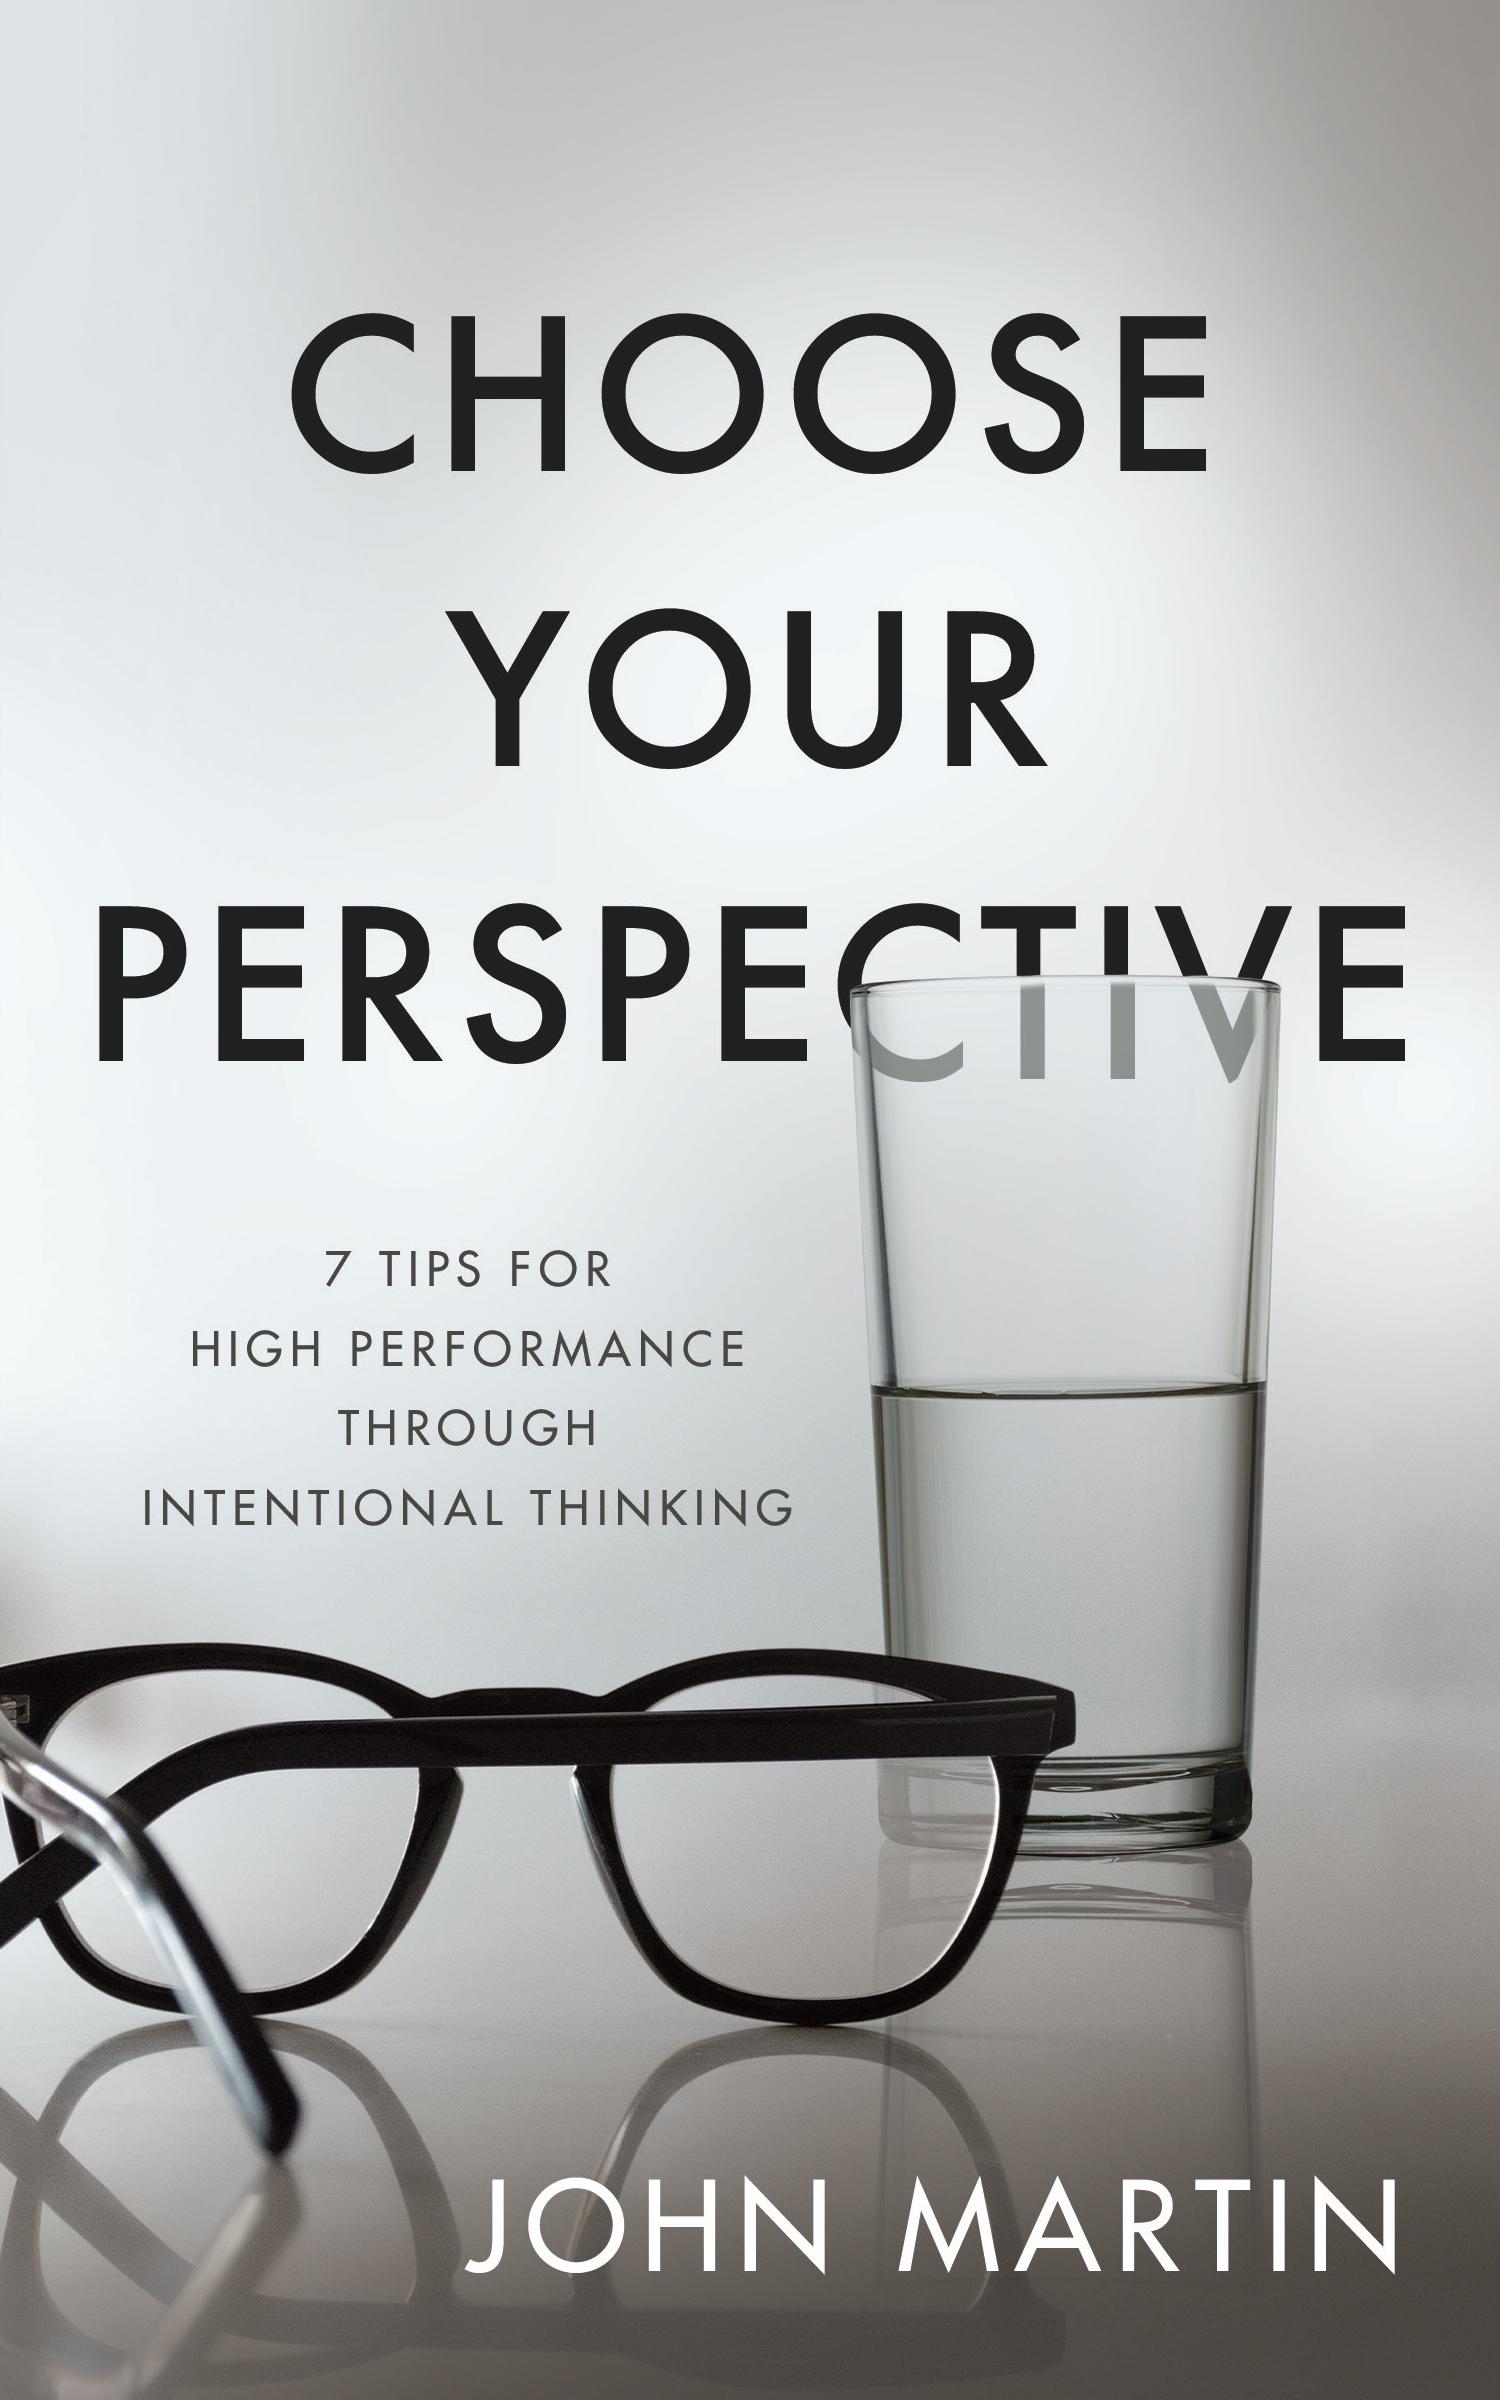 Choose Your Perspective - John Martin